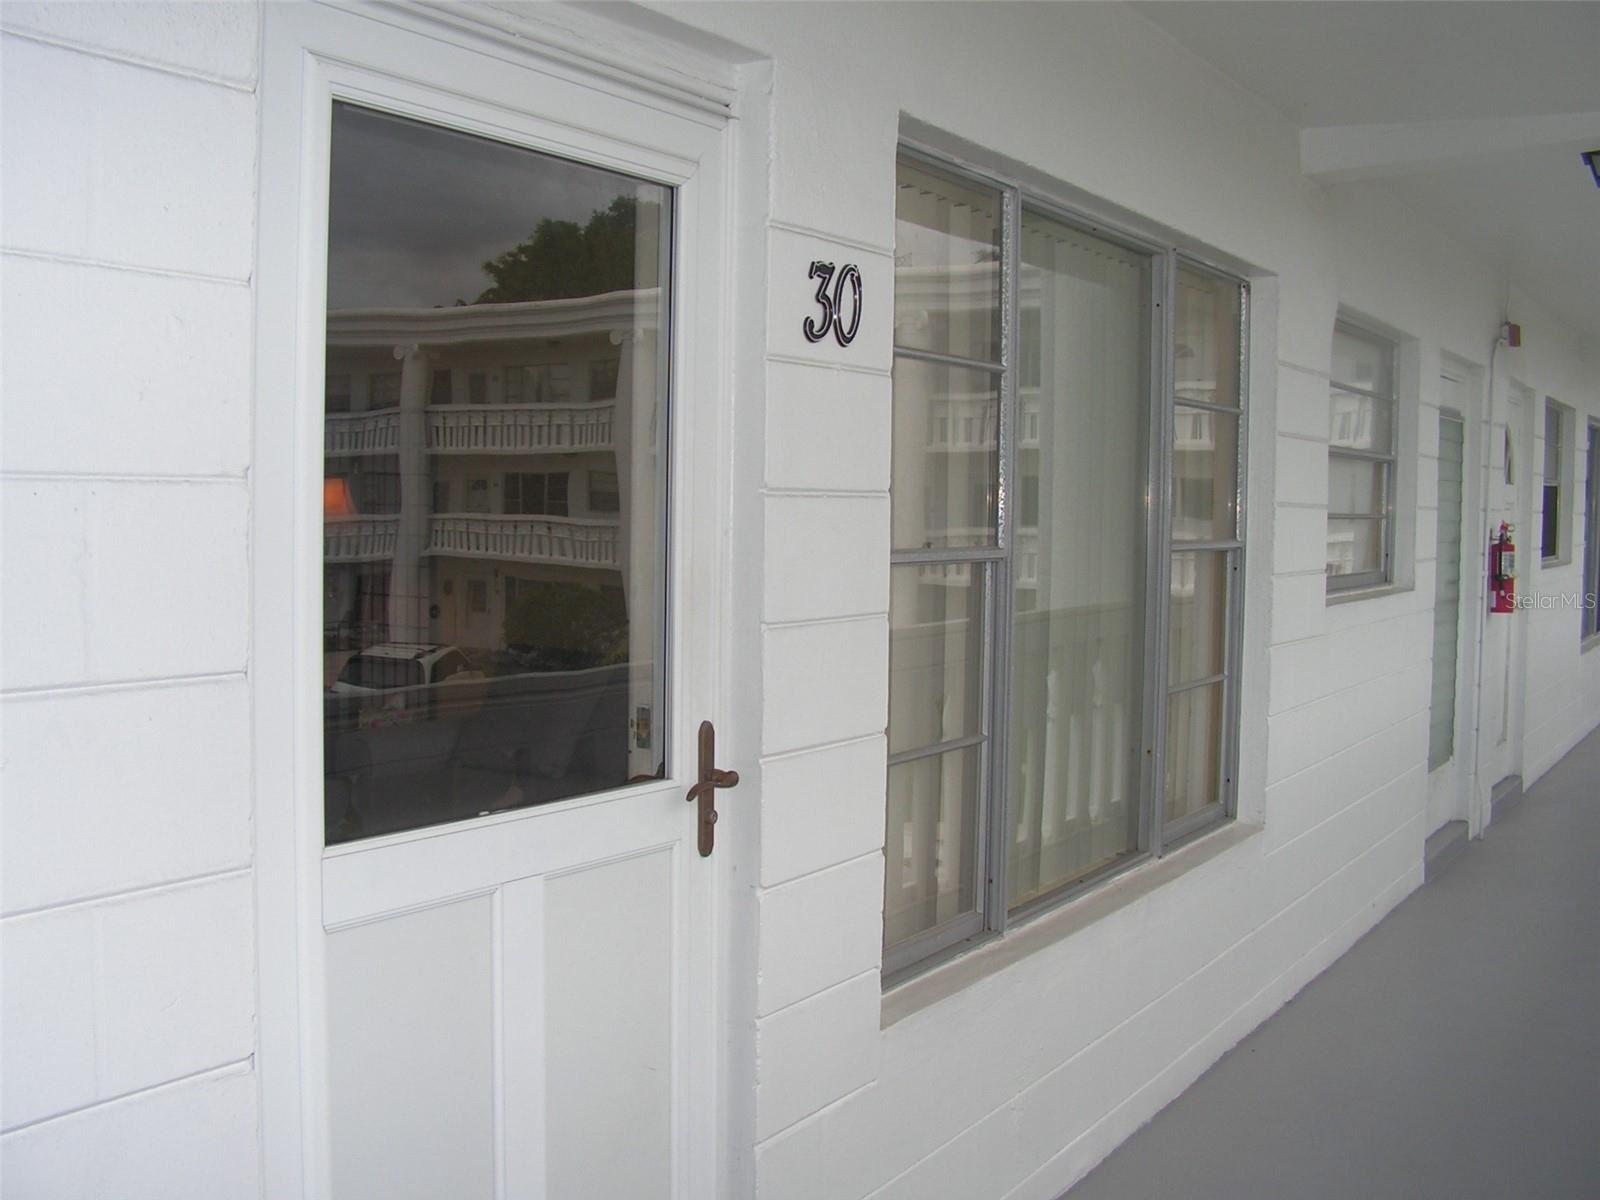 2454 AUSTRALIA WAY E #30, Clearwater, FL 33763 - #: U8131801